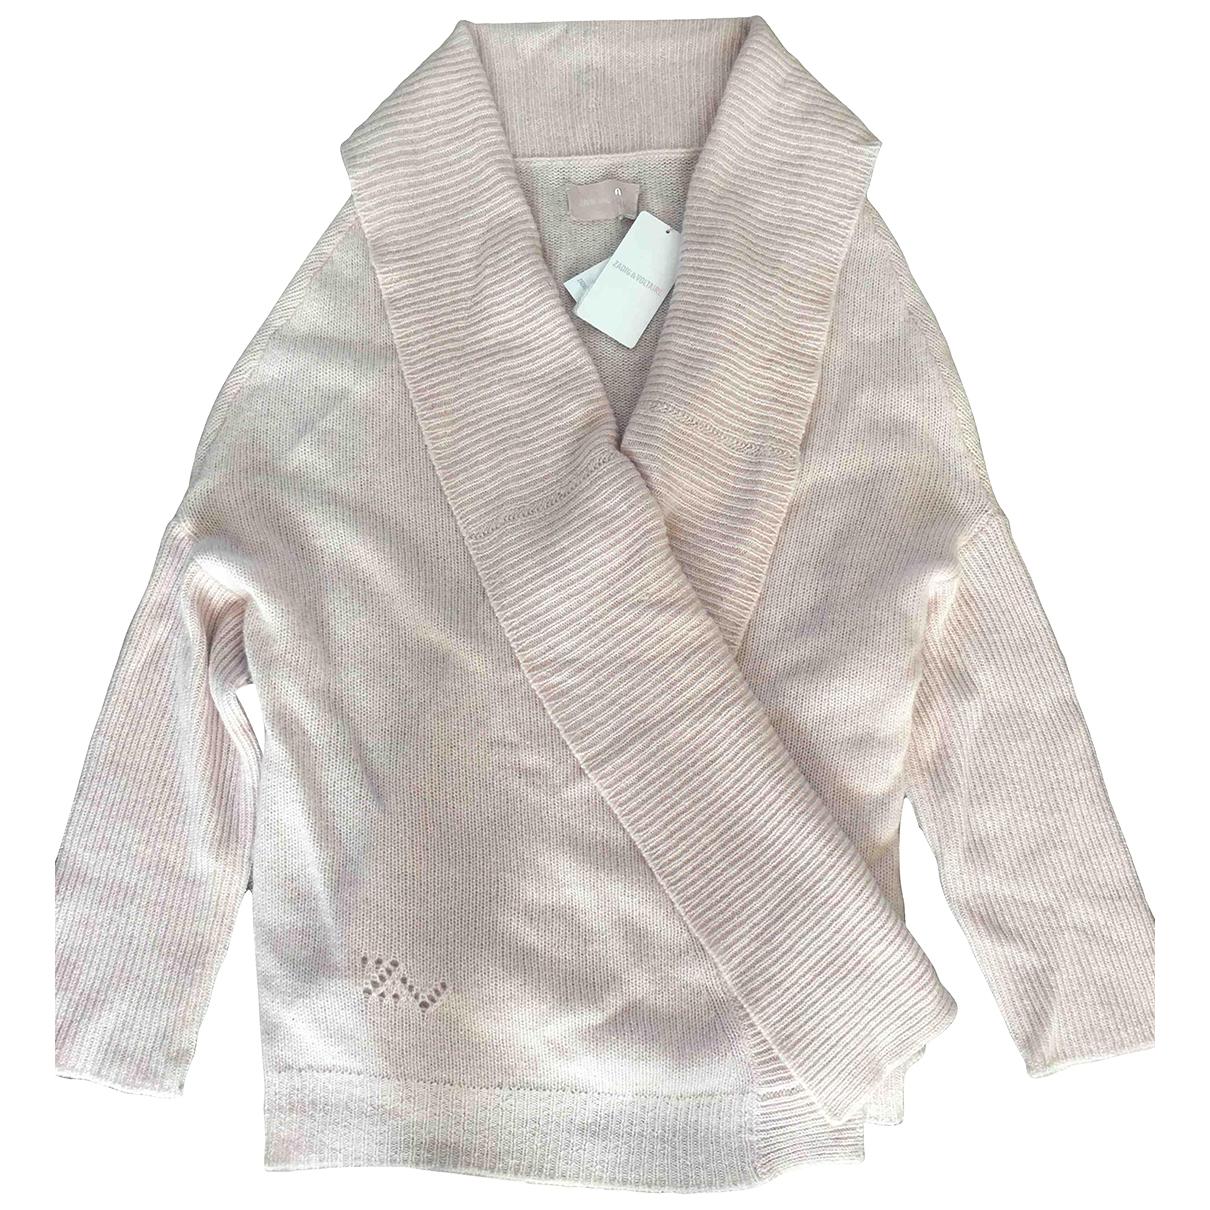 Zadig & Voltaire \N Pink Cashmere Knitwear for Women M International